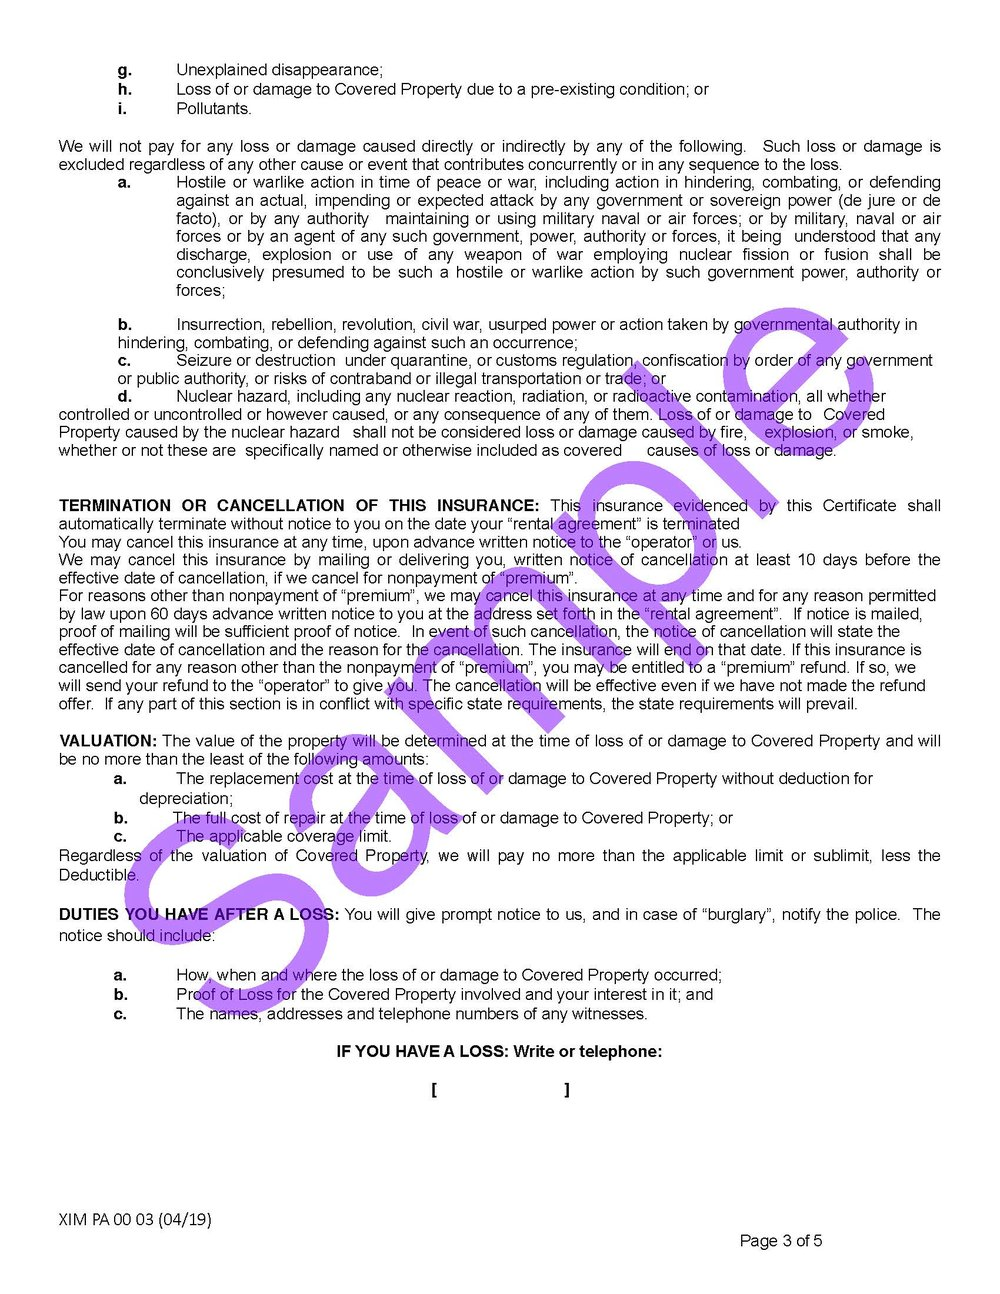 XIM PA 00 03 04 19 Pennsylvania Certificate of InsuranceSample_Page_3.jpg